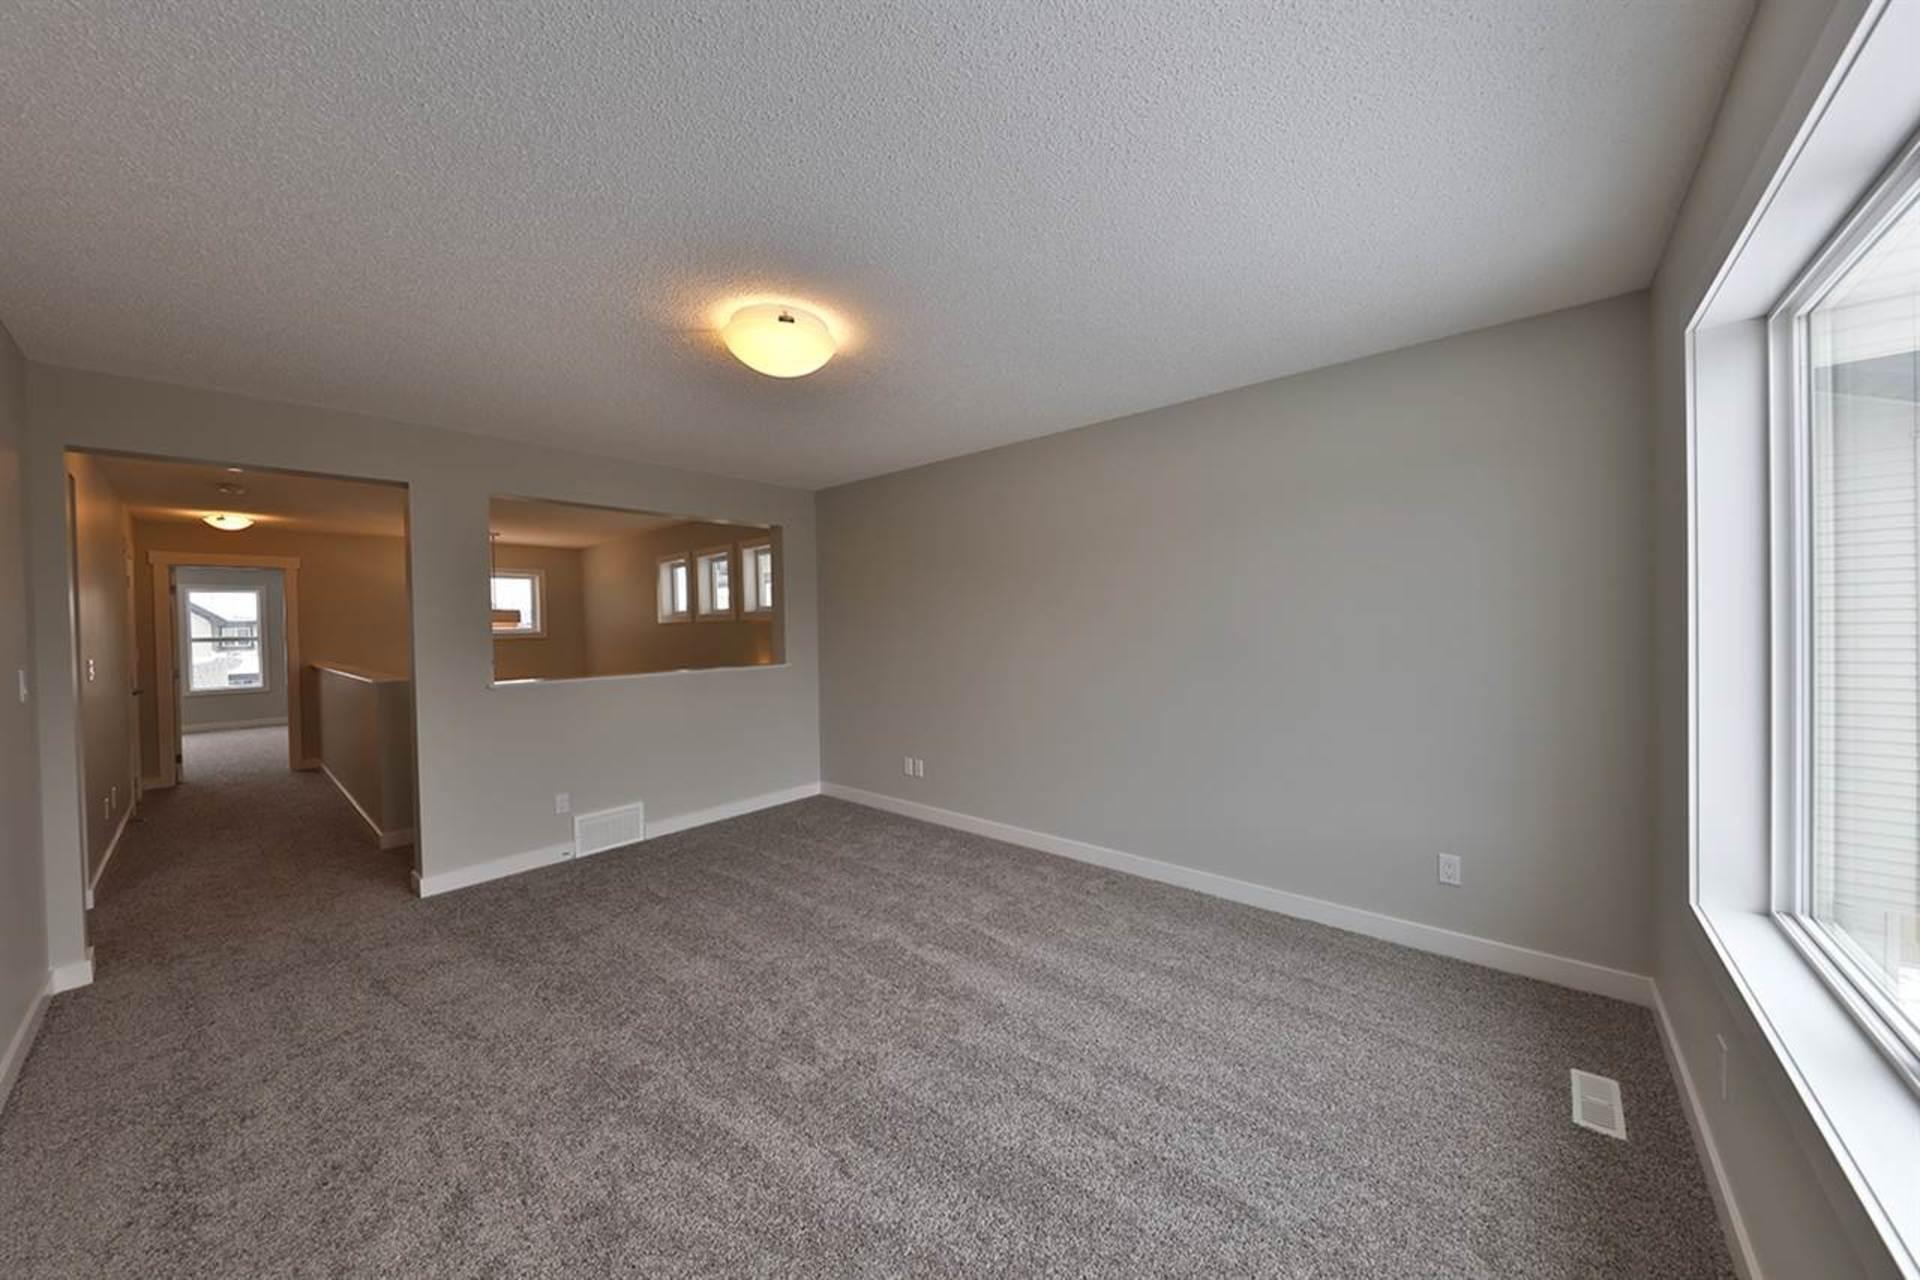 17550-60a-street-mcconachie-area-edmonton-20 at 17550 60a Street, McConachie Area, Edmonton